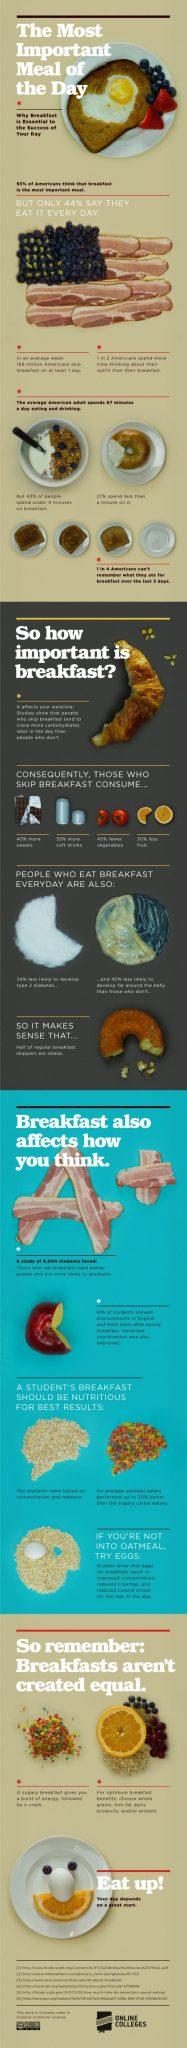 breakfast-infographic-640x7010